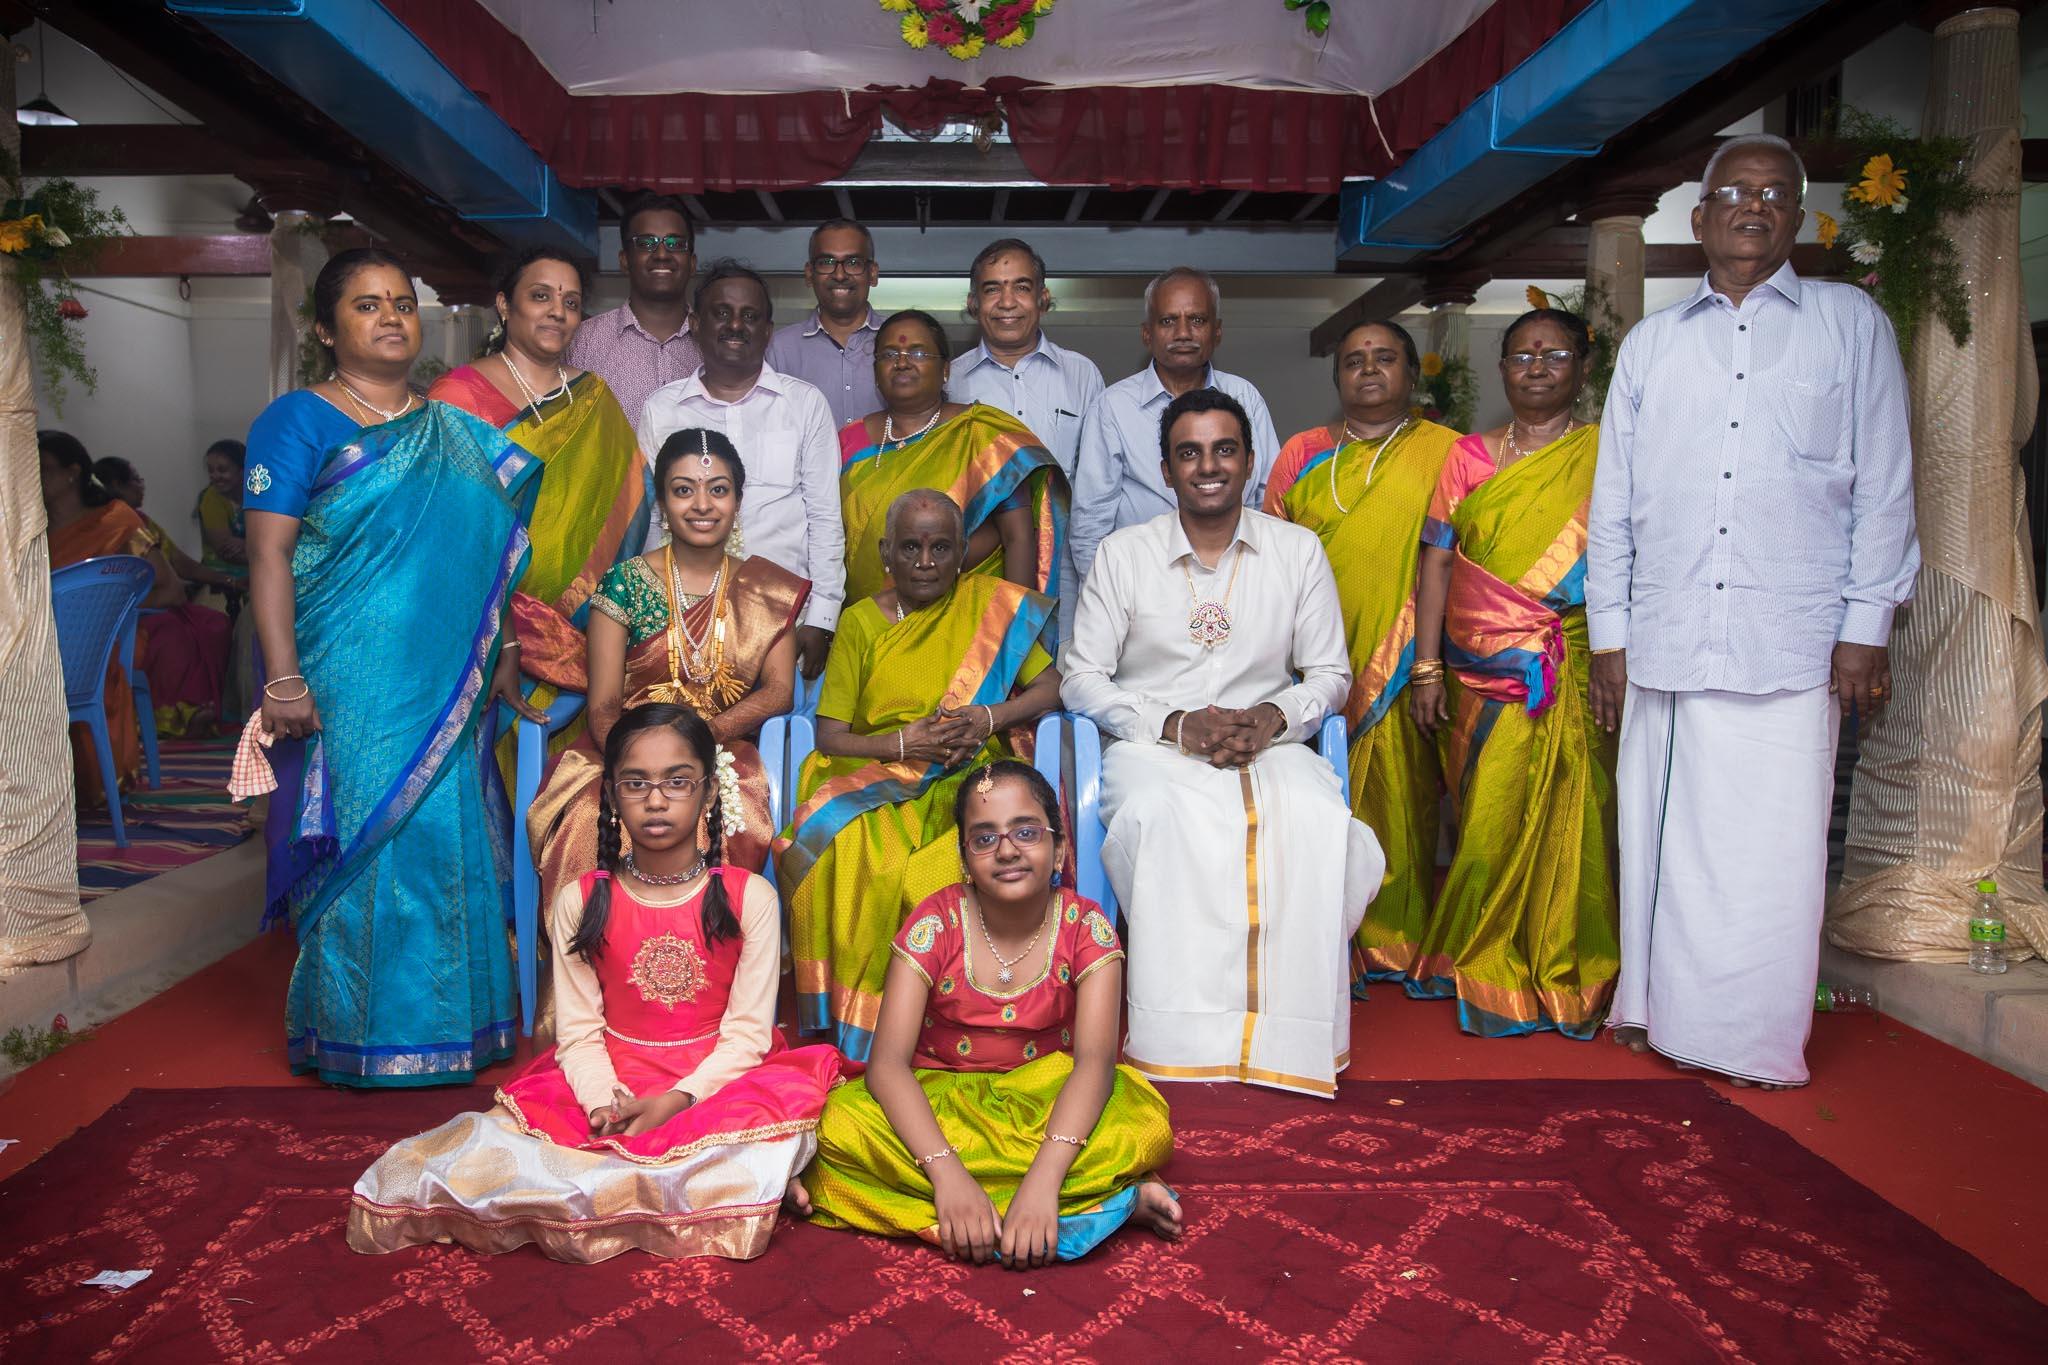 karaikudi-chettinad-wedding-photos1